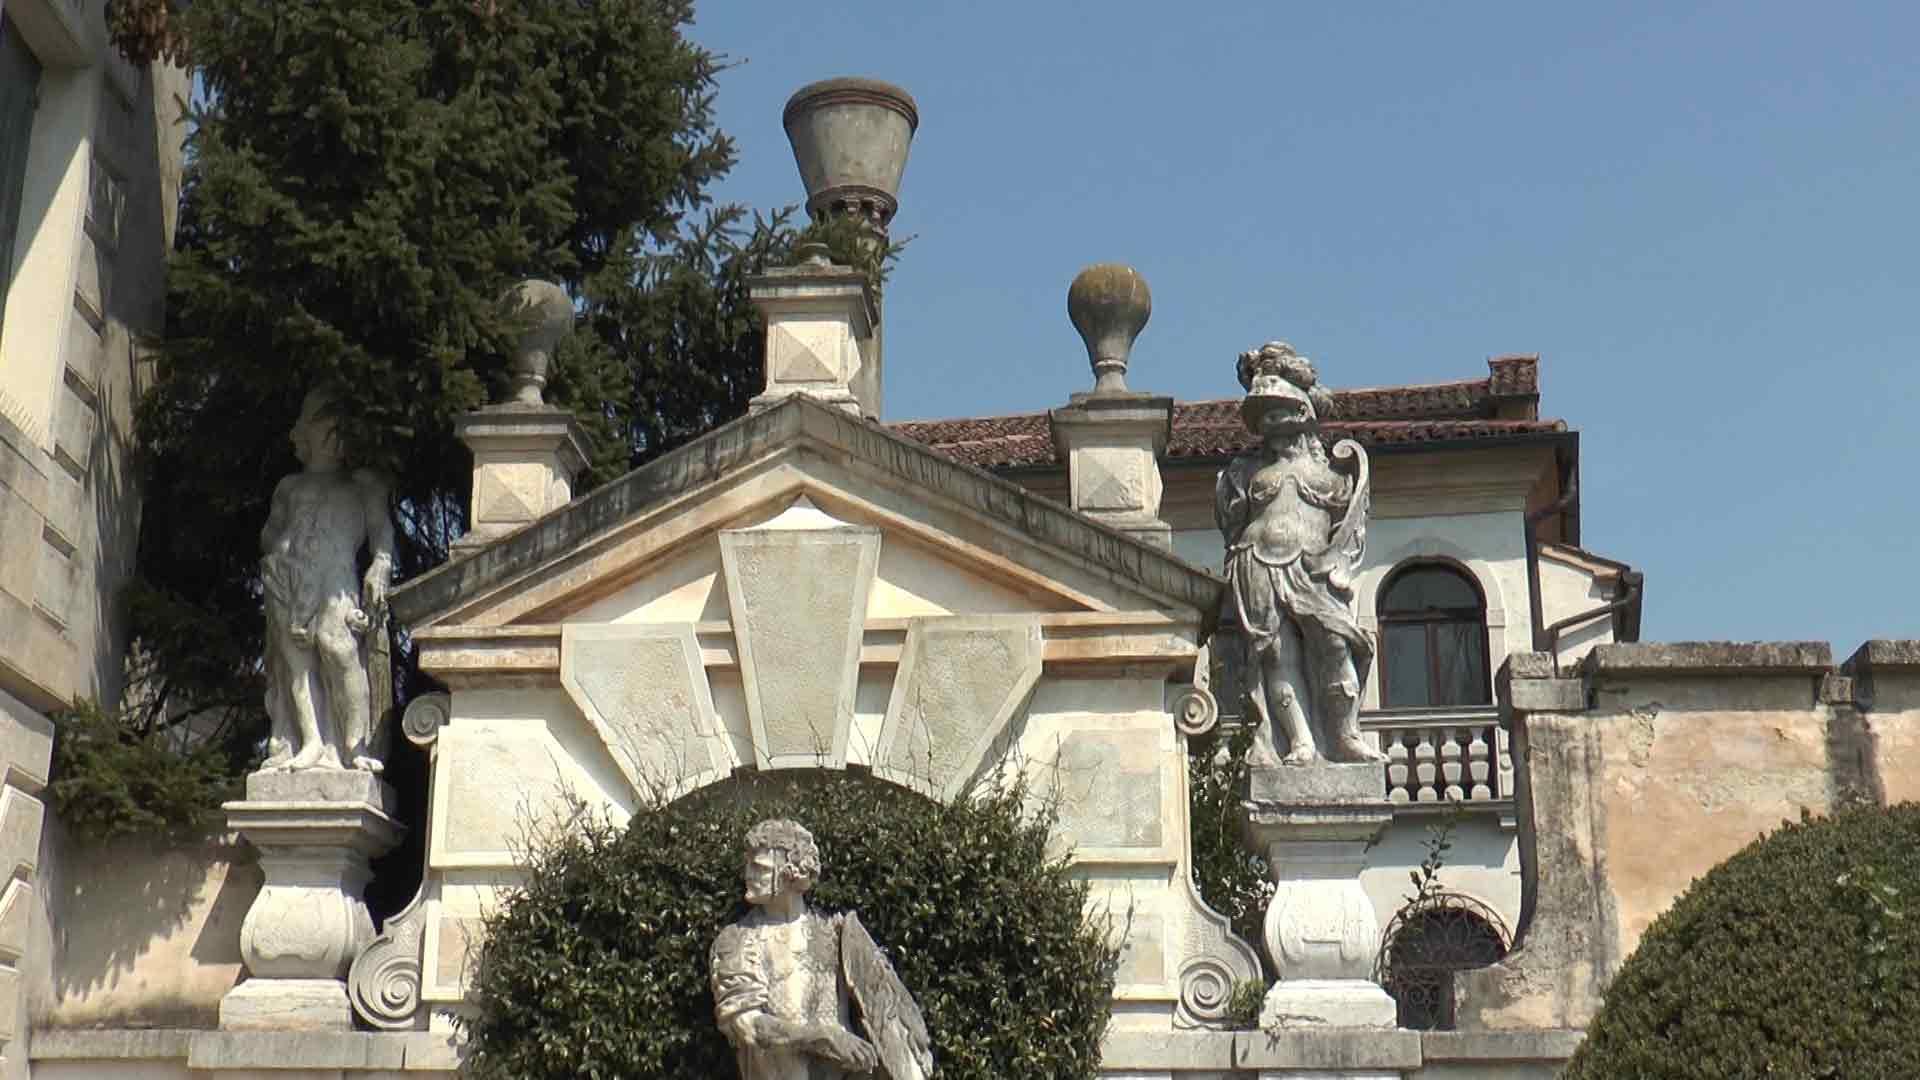 Riviera del Brenta - Stra, Villa Imperiale